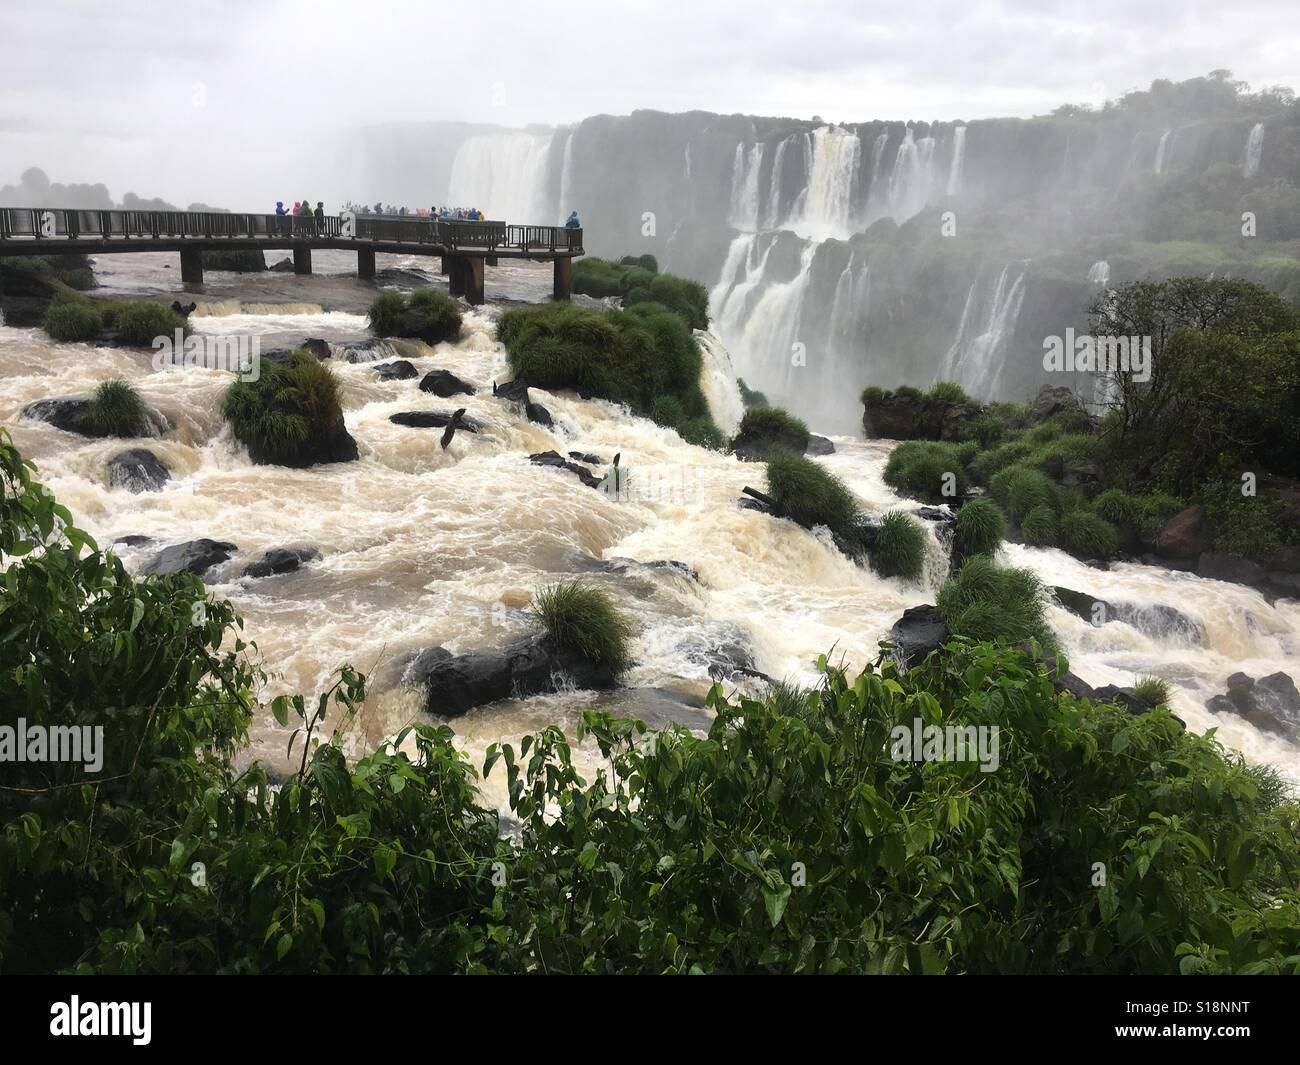 Iguassu Falls Boardwalk and Devils Throat - Stock Image